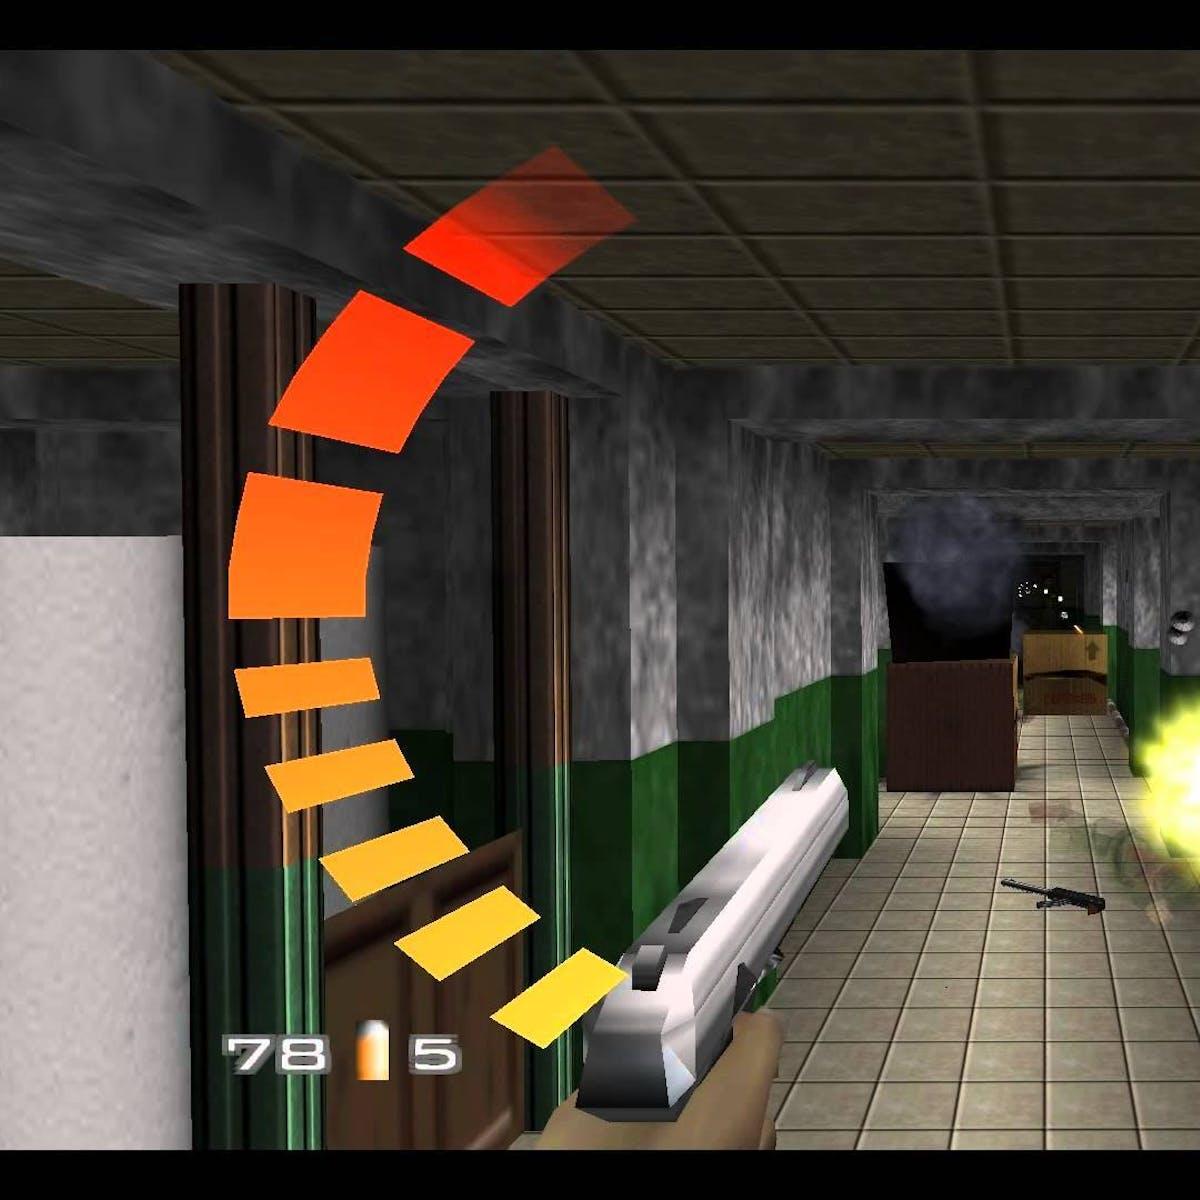 How to Download Retro Game Emulators | Inverse